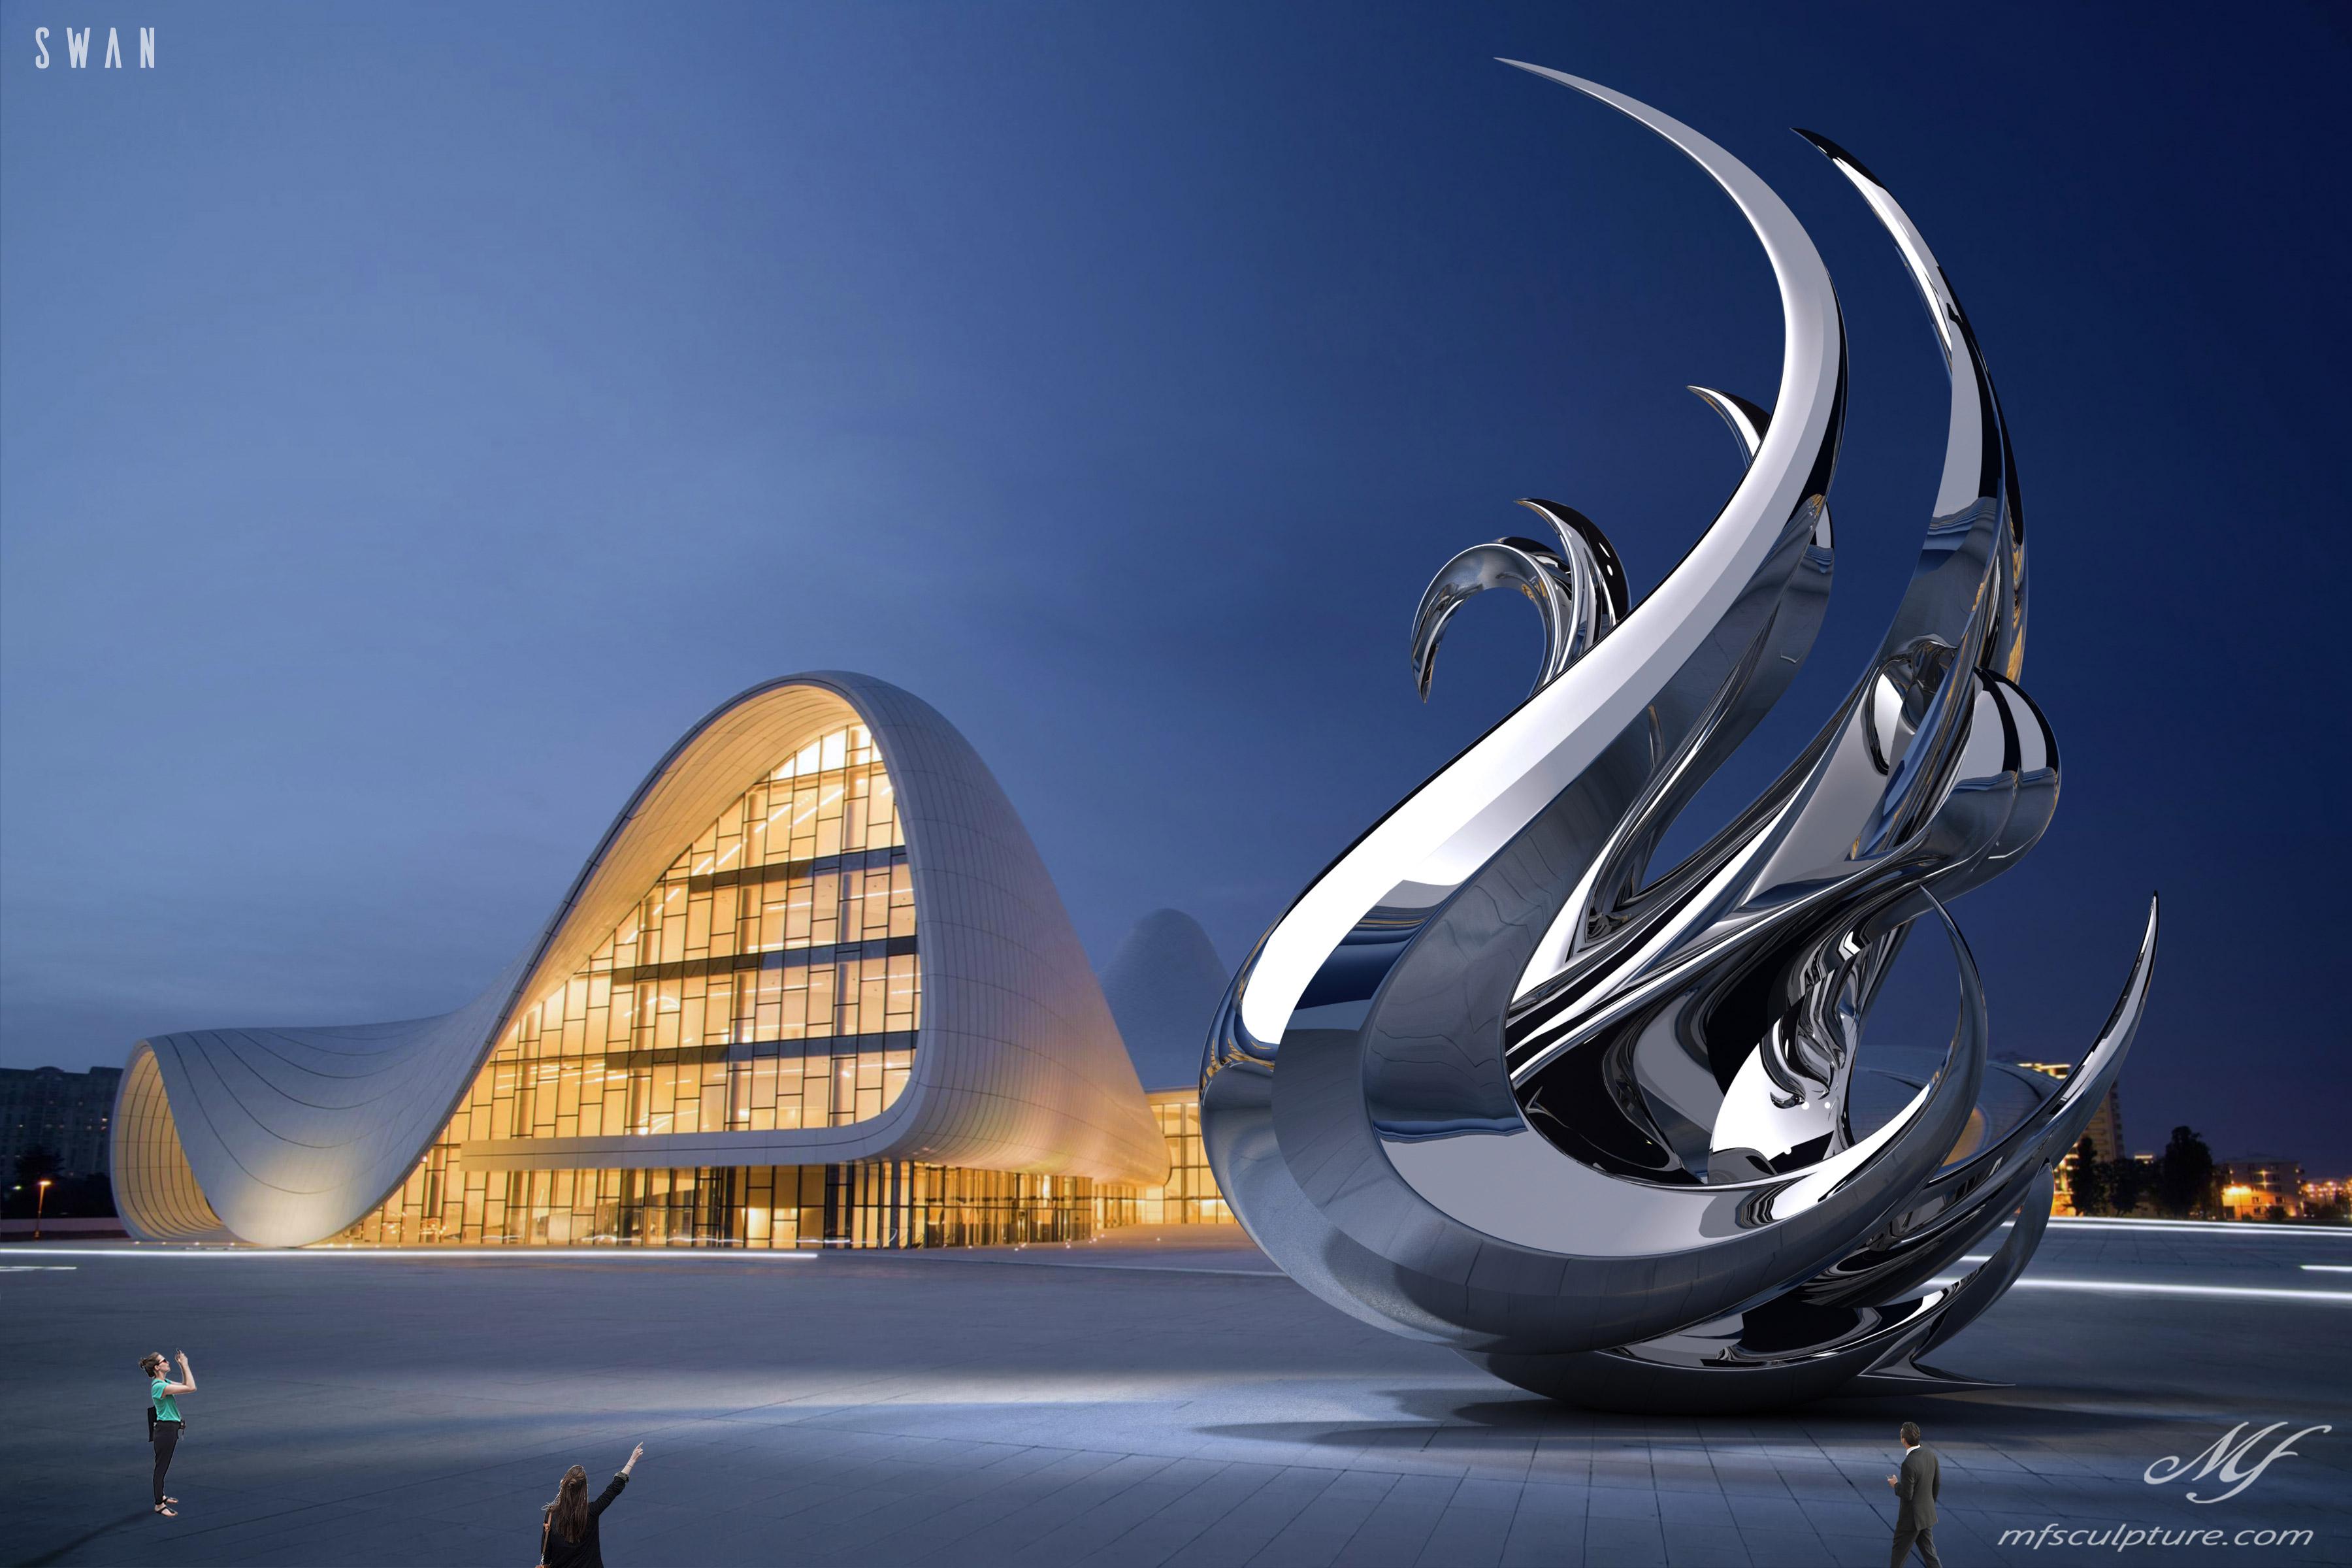 Heydar Aliyev Zaha Hadid Convergence Modern Sculpture Public Art Swan Contemporary 6